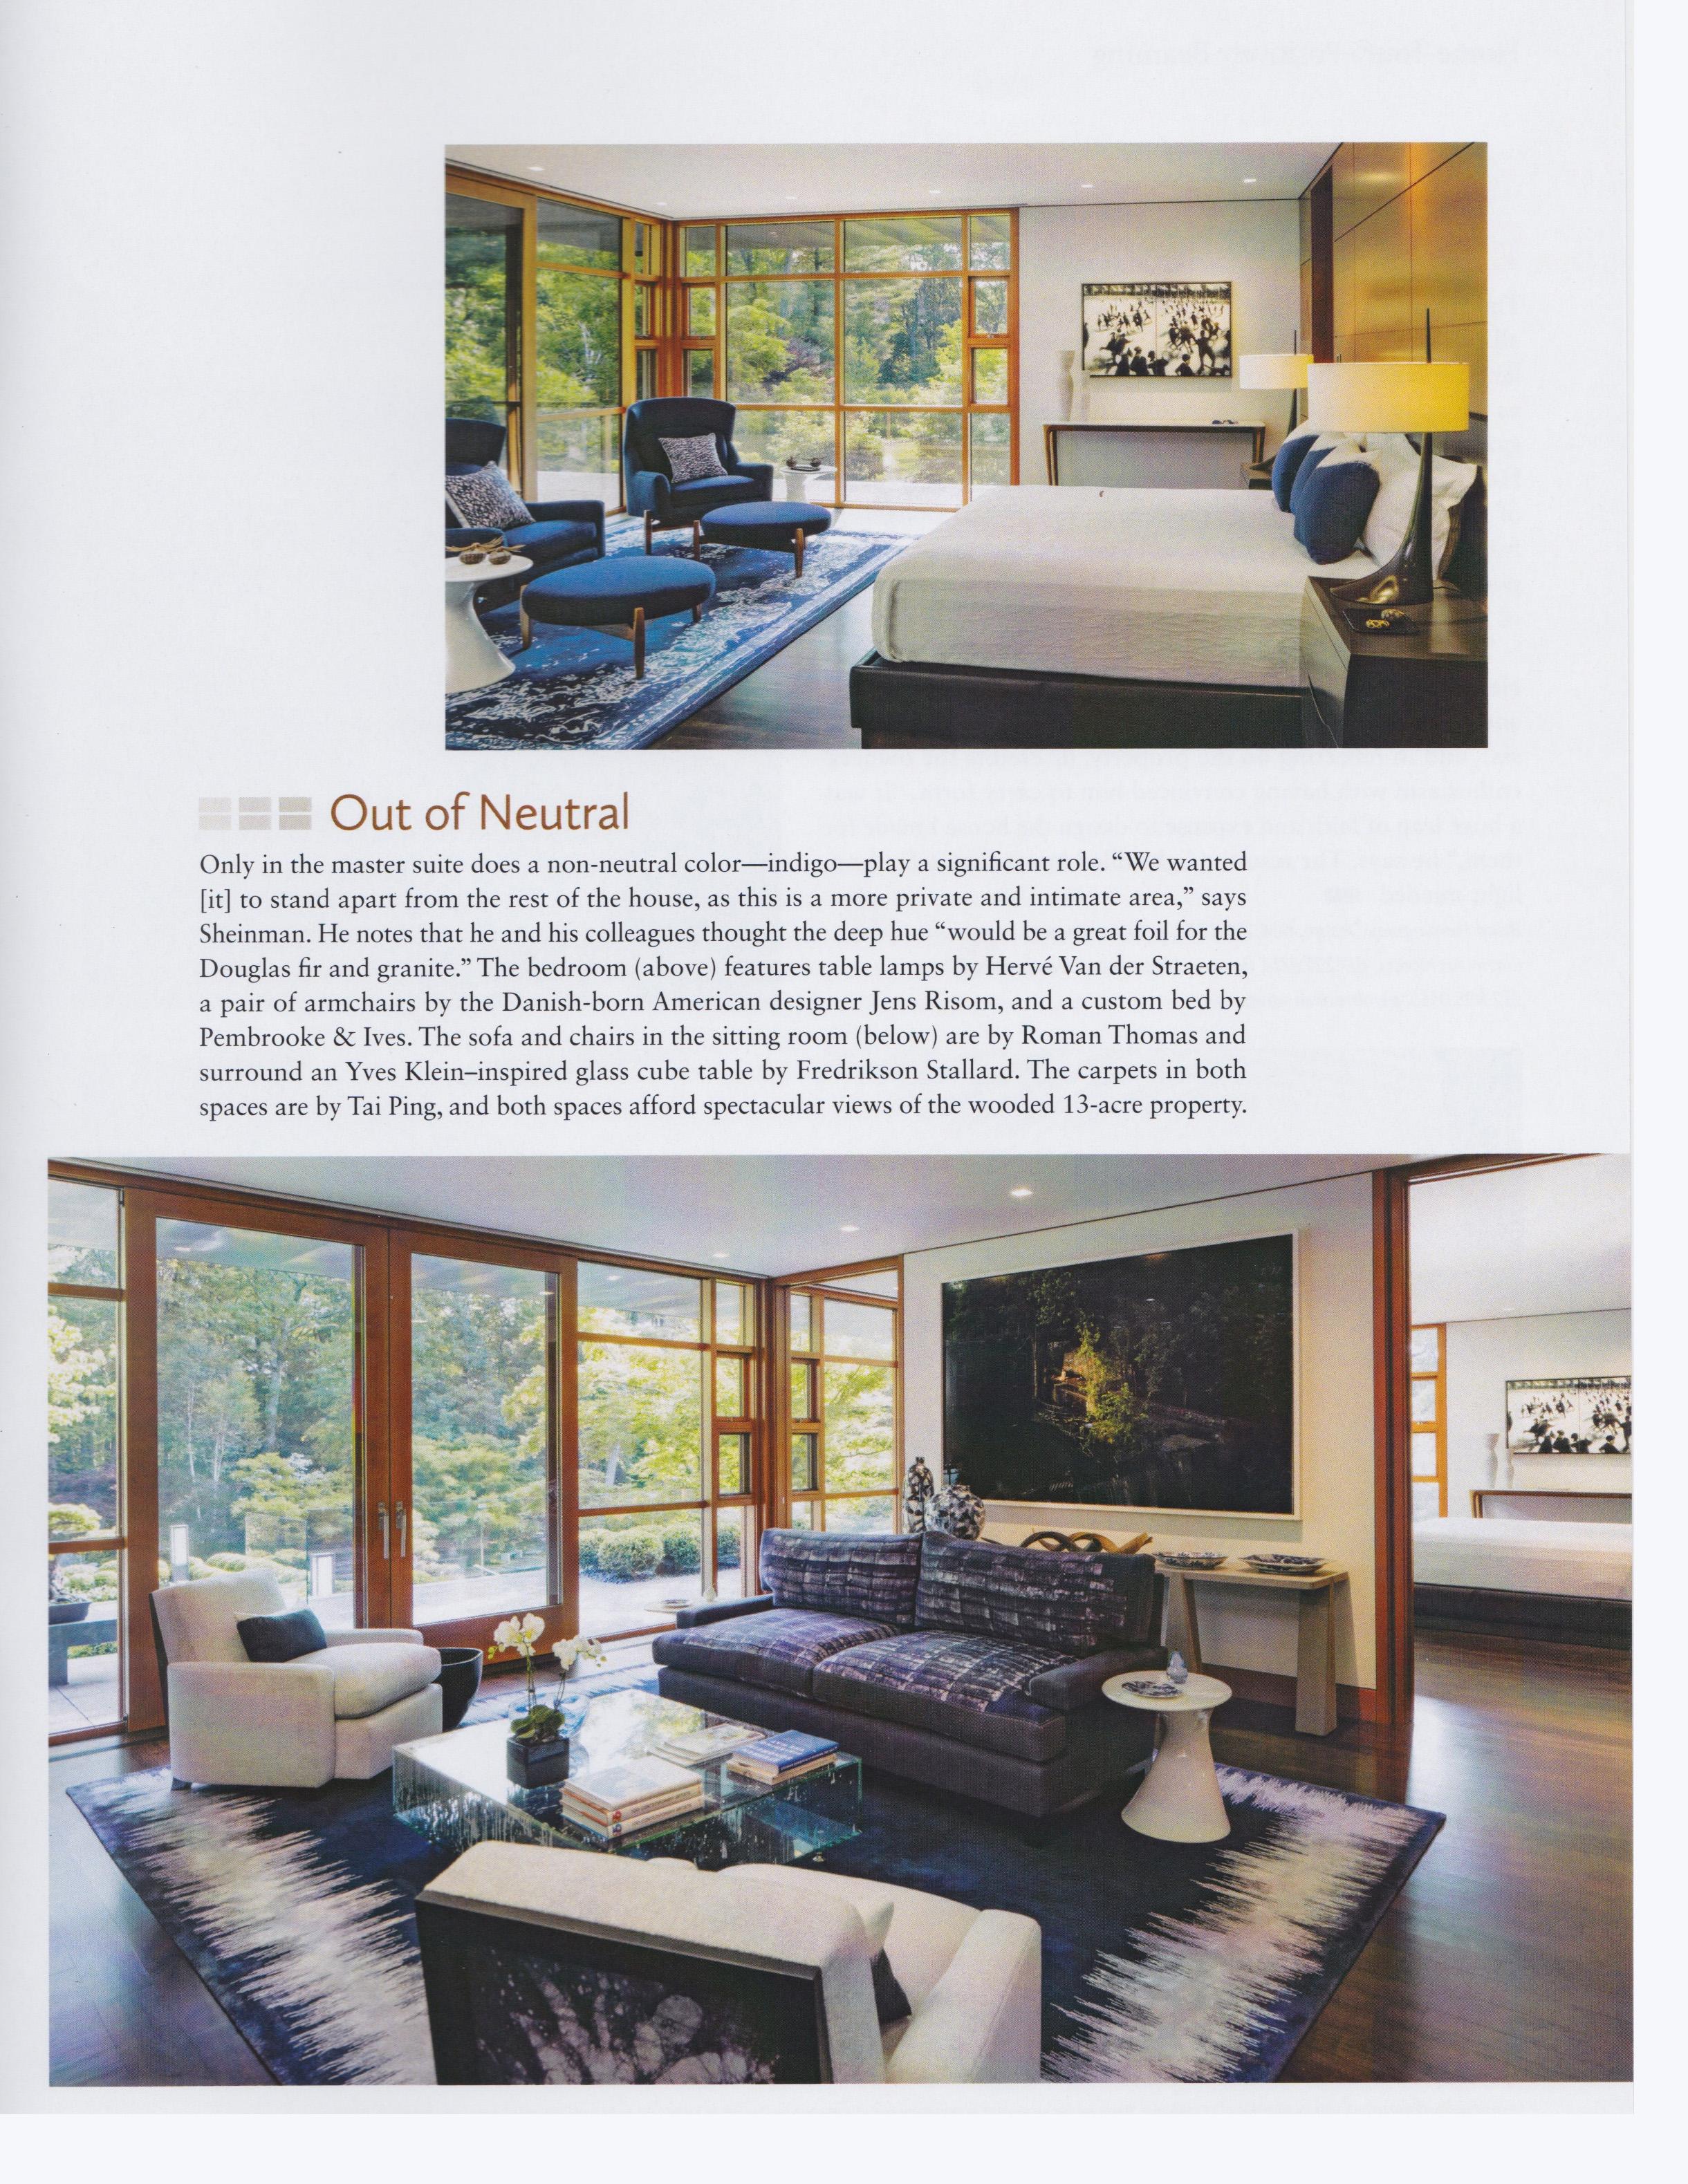 robb report pg 10.jpg